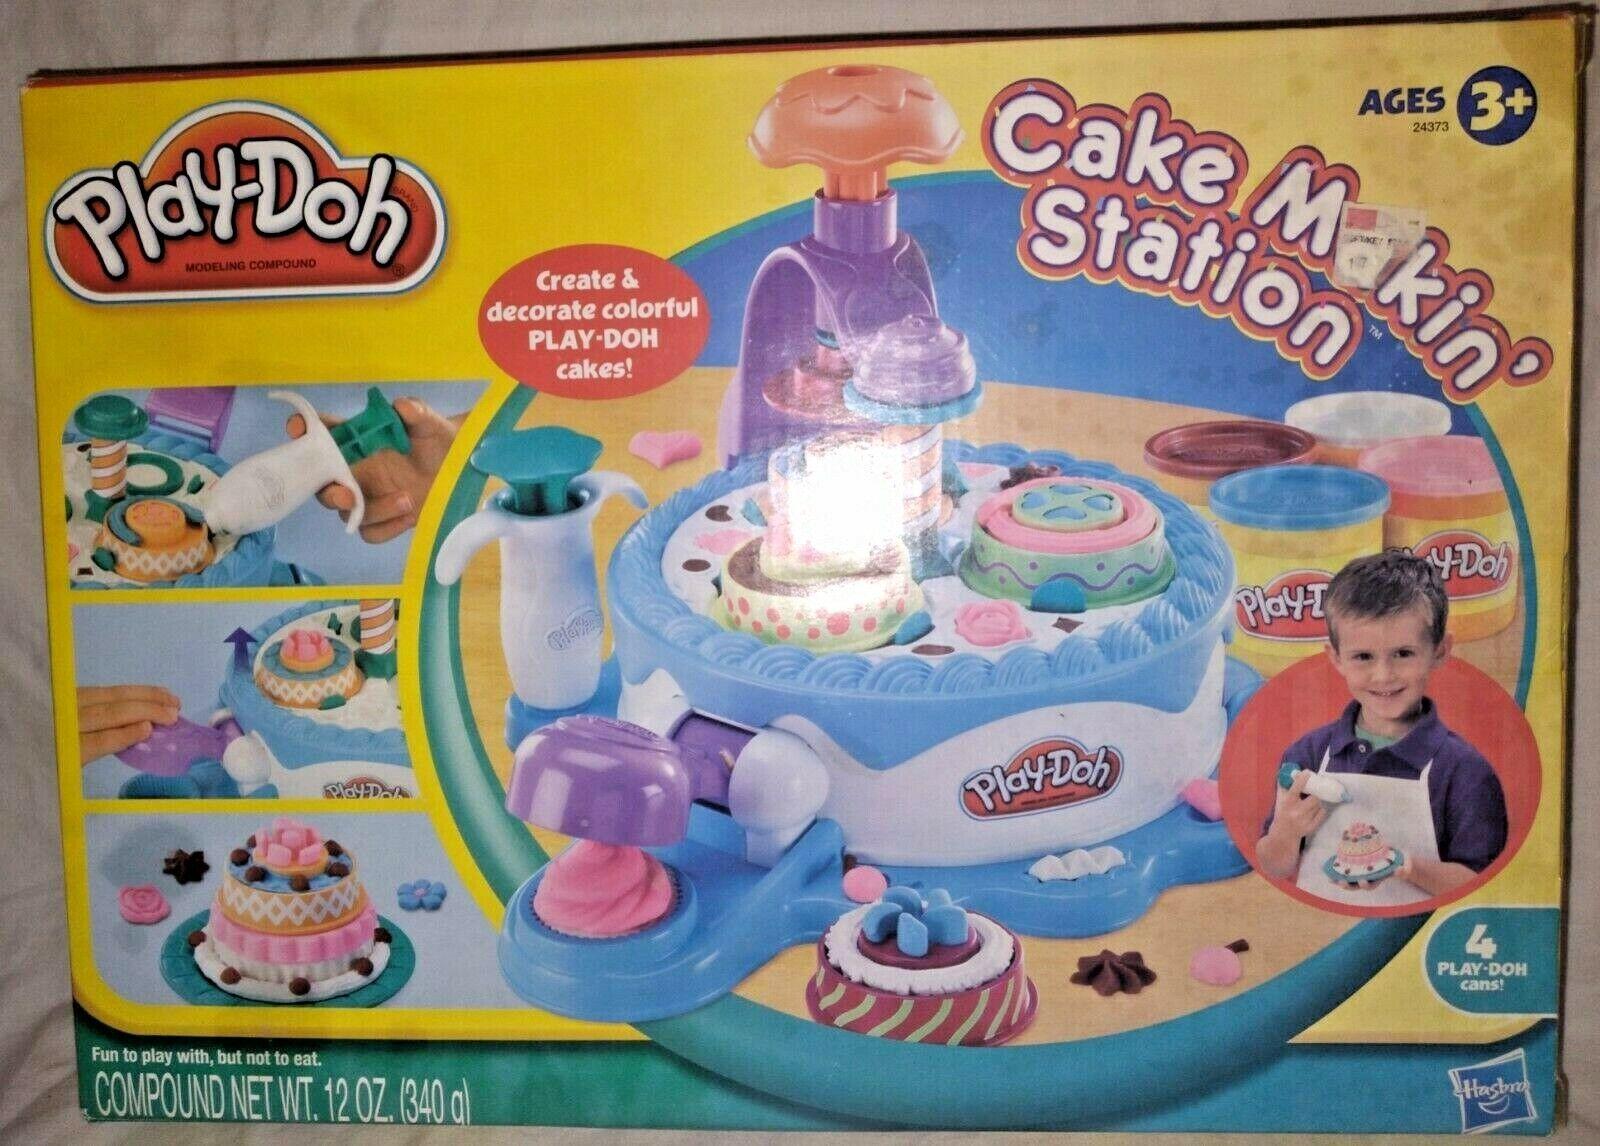 2020 New purchase Play-doh Hasbro Cake Makin Station Set